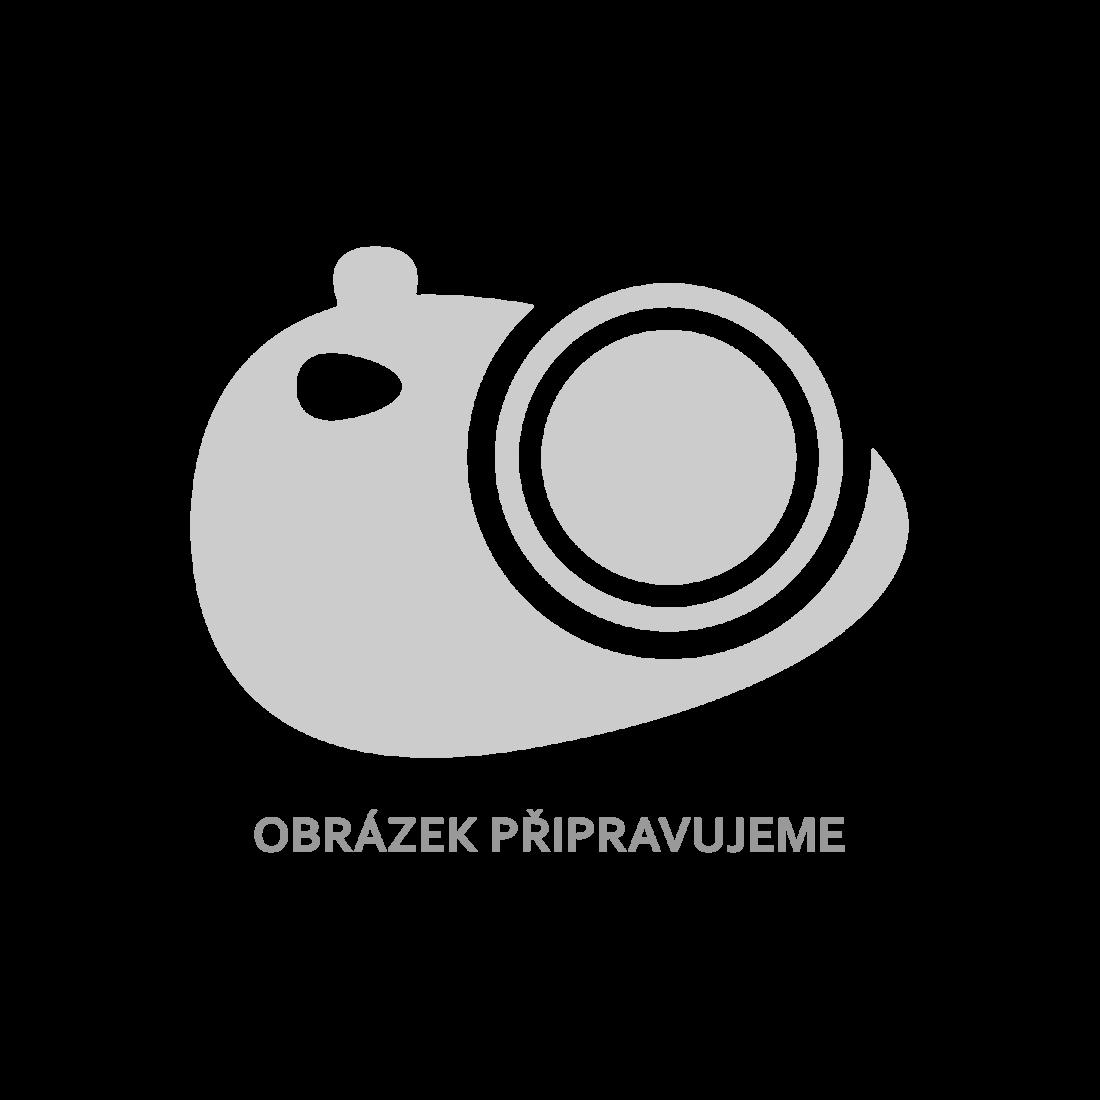 vidaXL Zahradní stůl antracitový 89 cm plast [48807]